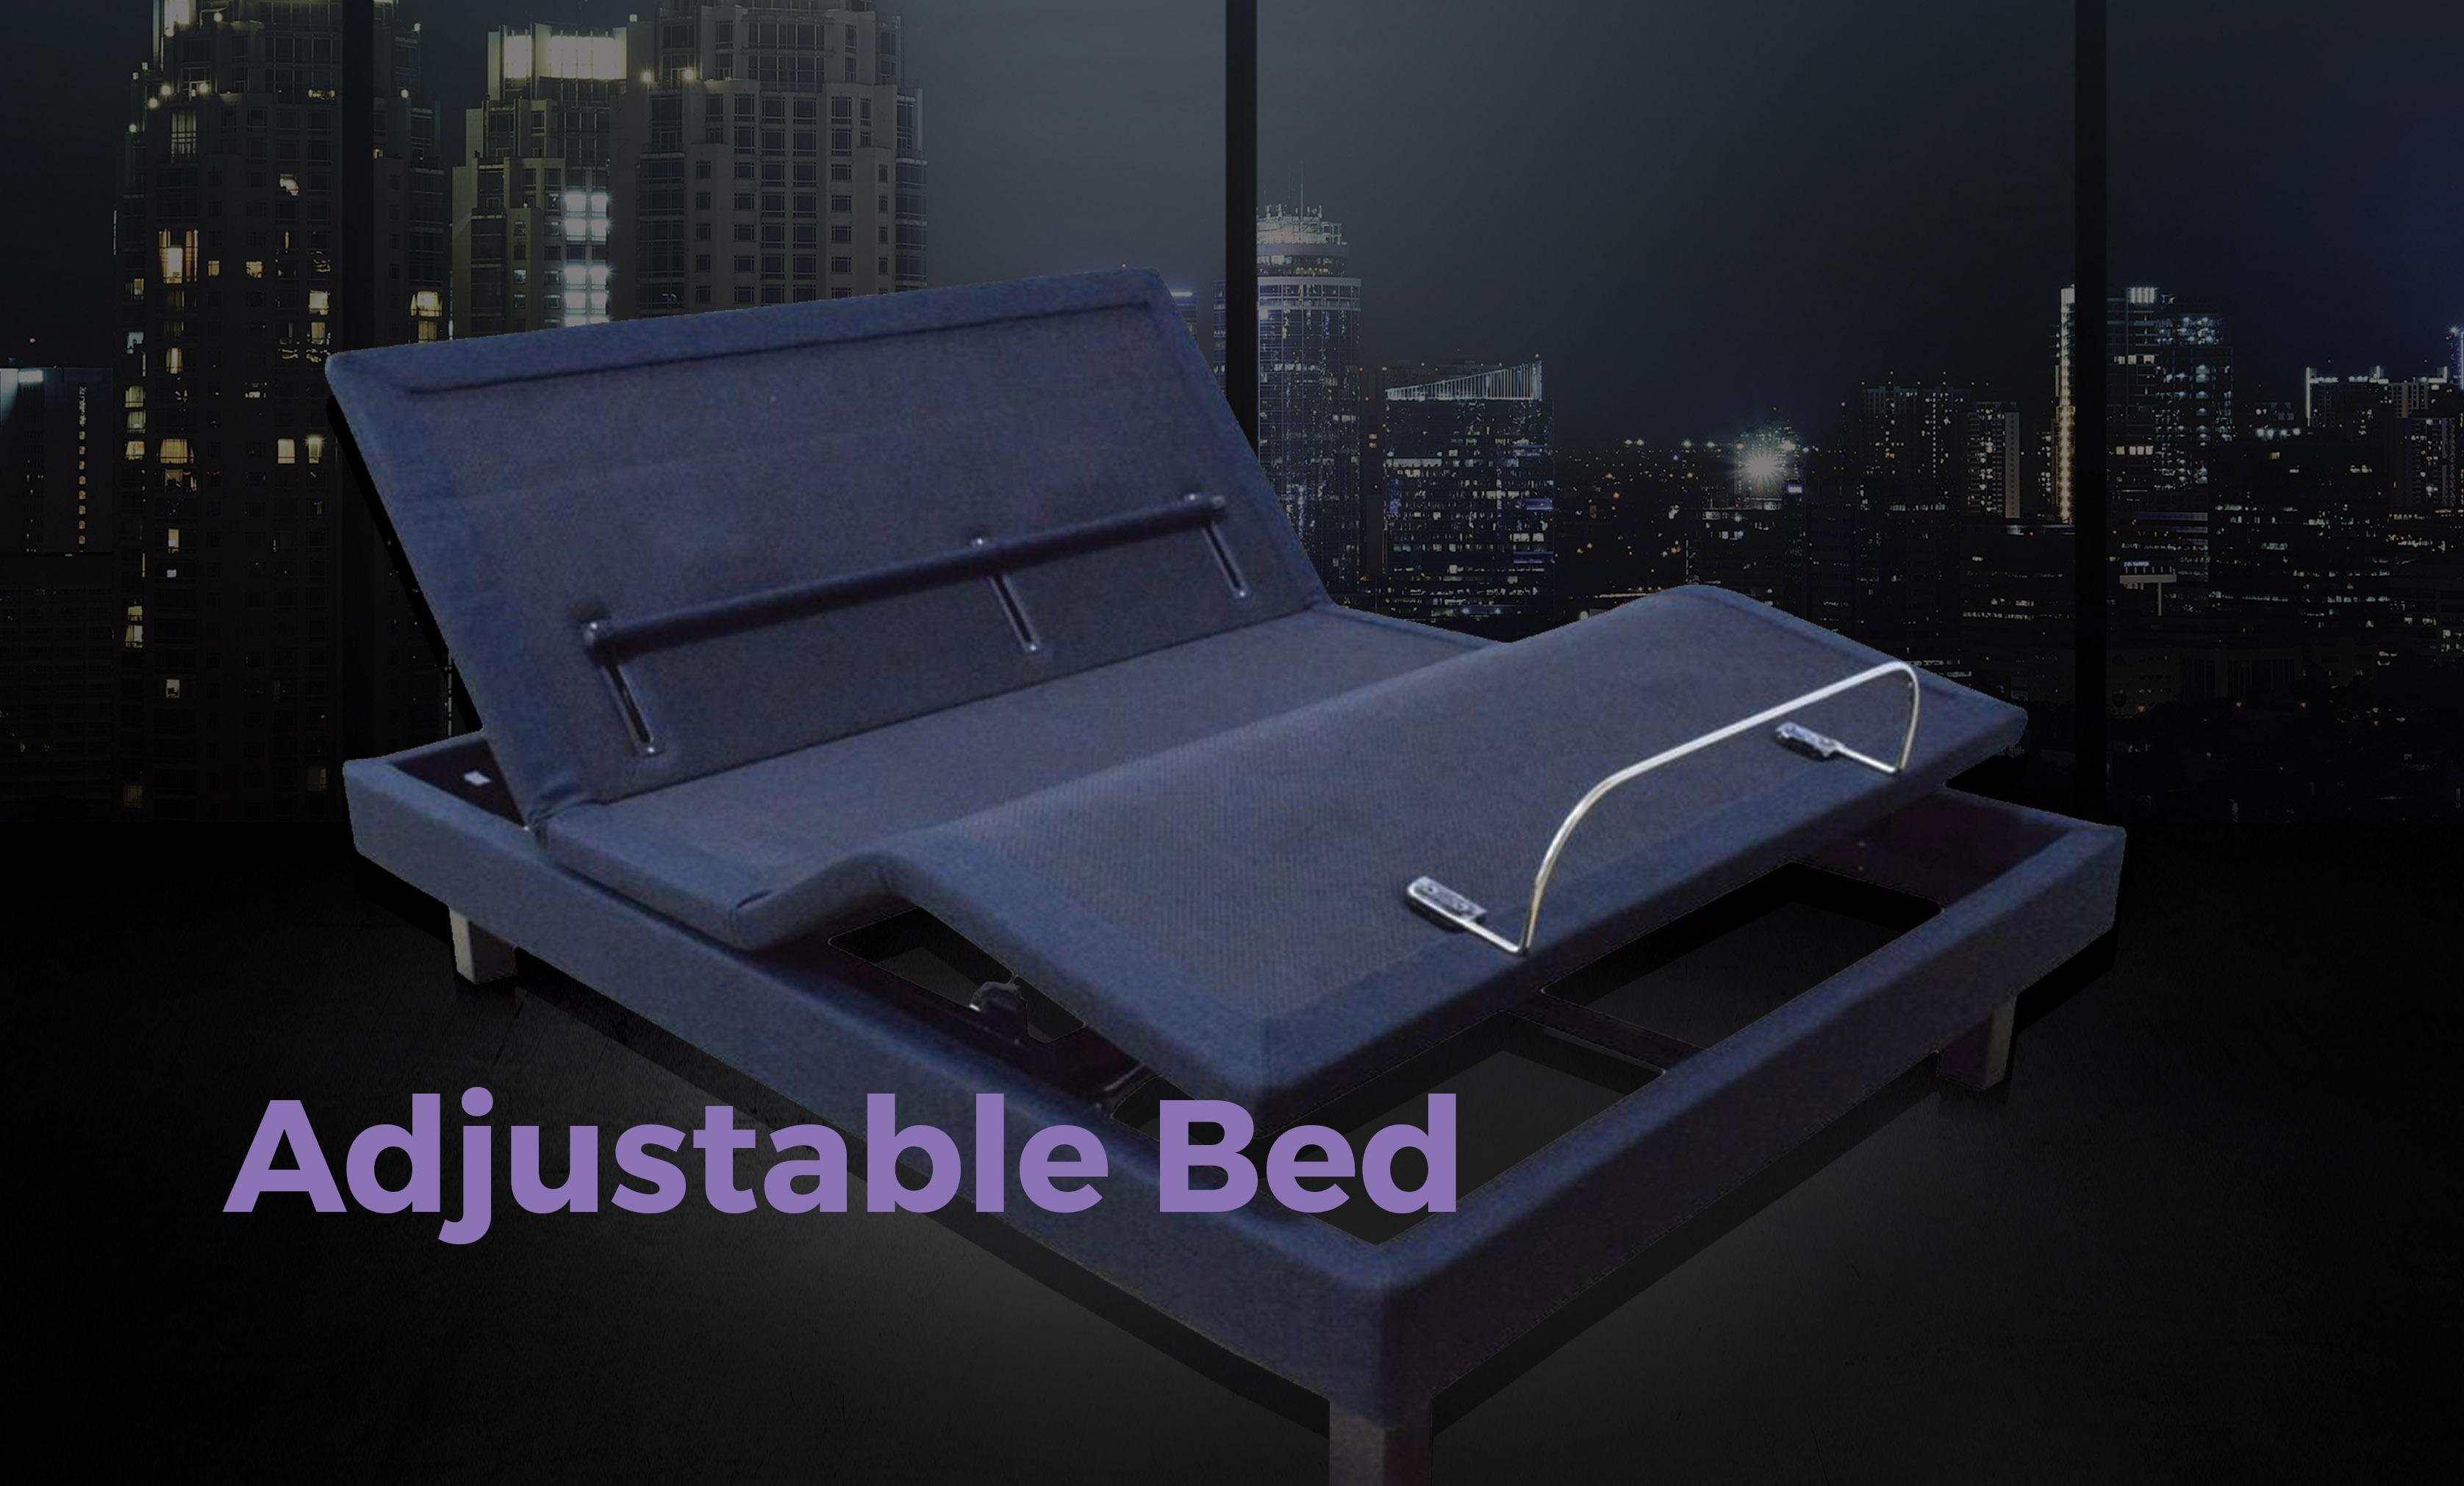 http://sleepaustralasia.com.au/wp-content/uploads/2015/10/adjustable-beds_img-1.jpg